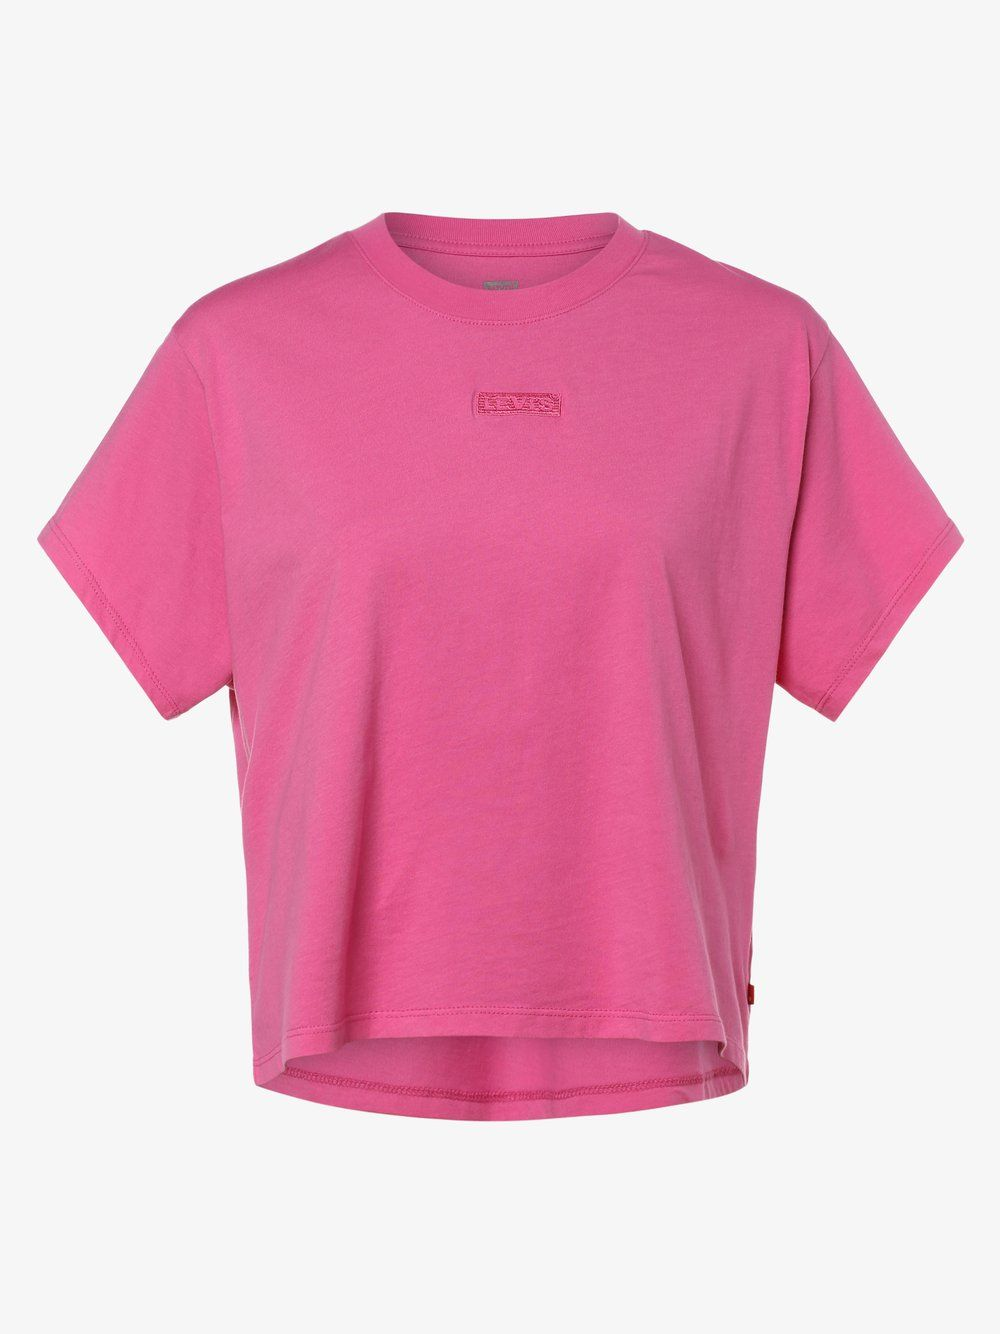 Levi's Damen T-Shirt online kaufen   T shirt damen, Levi's ...